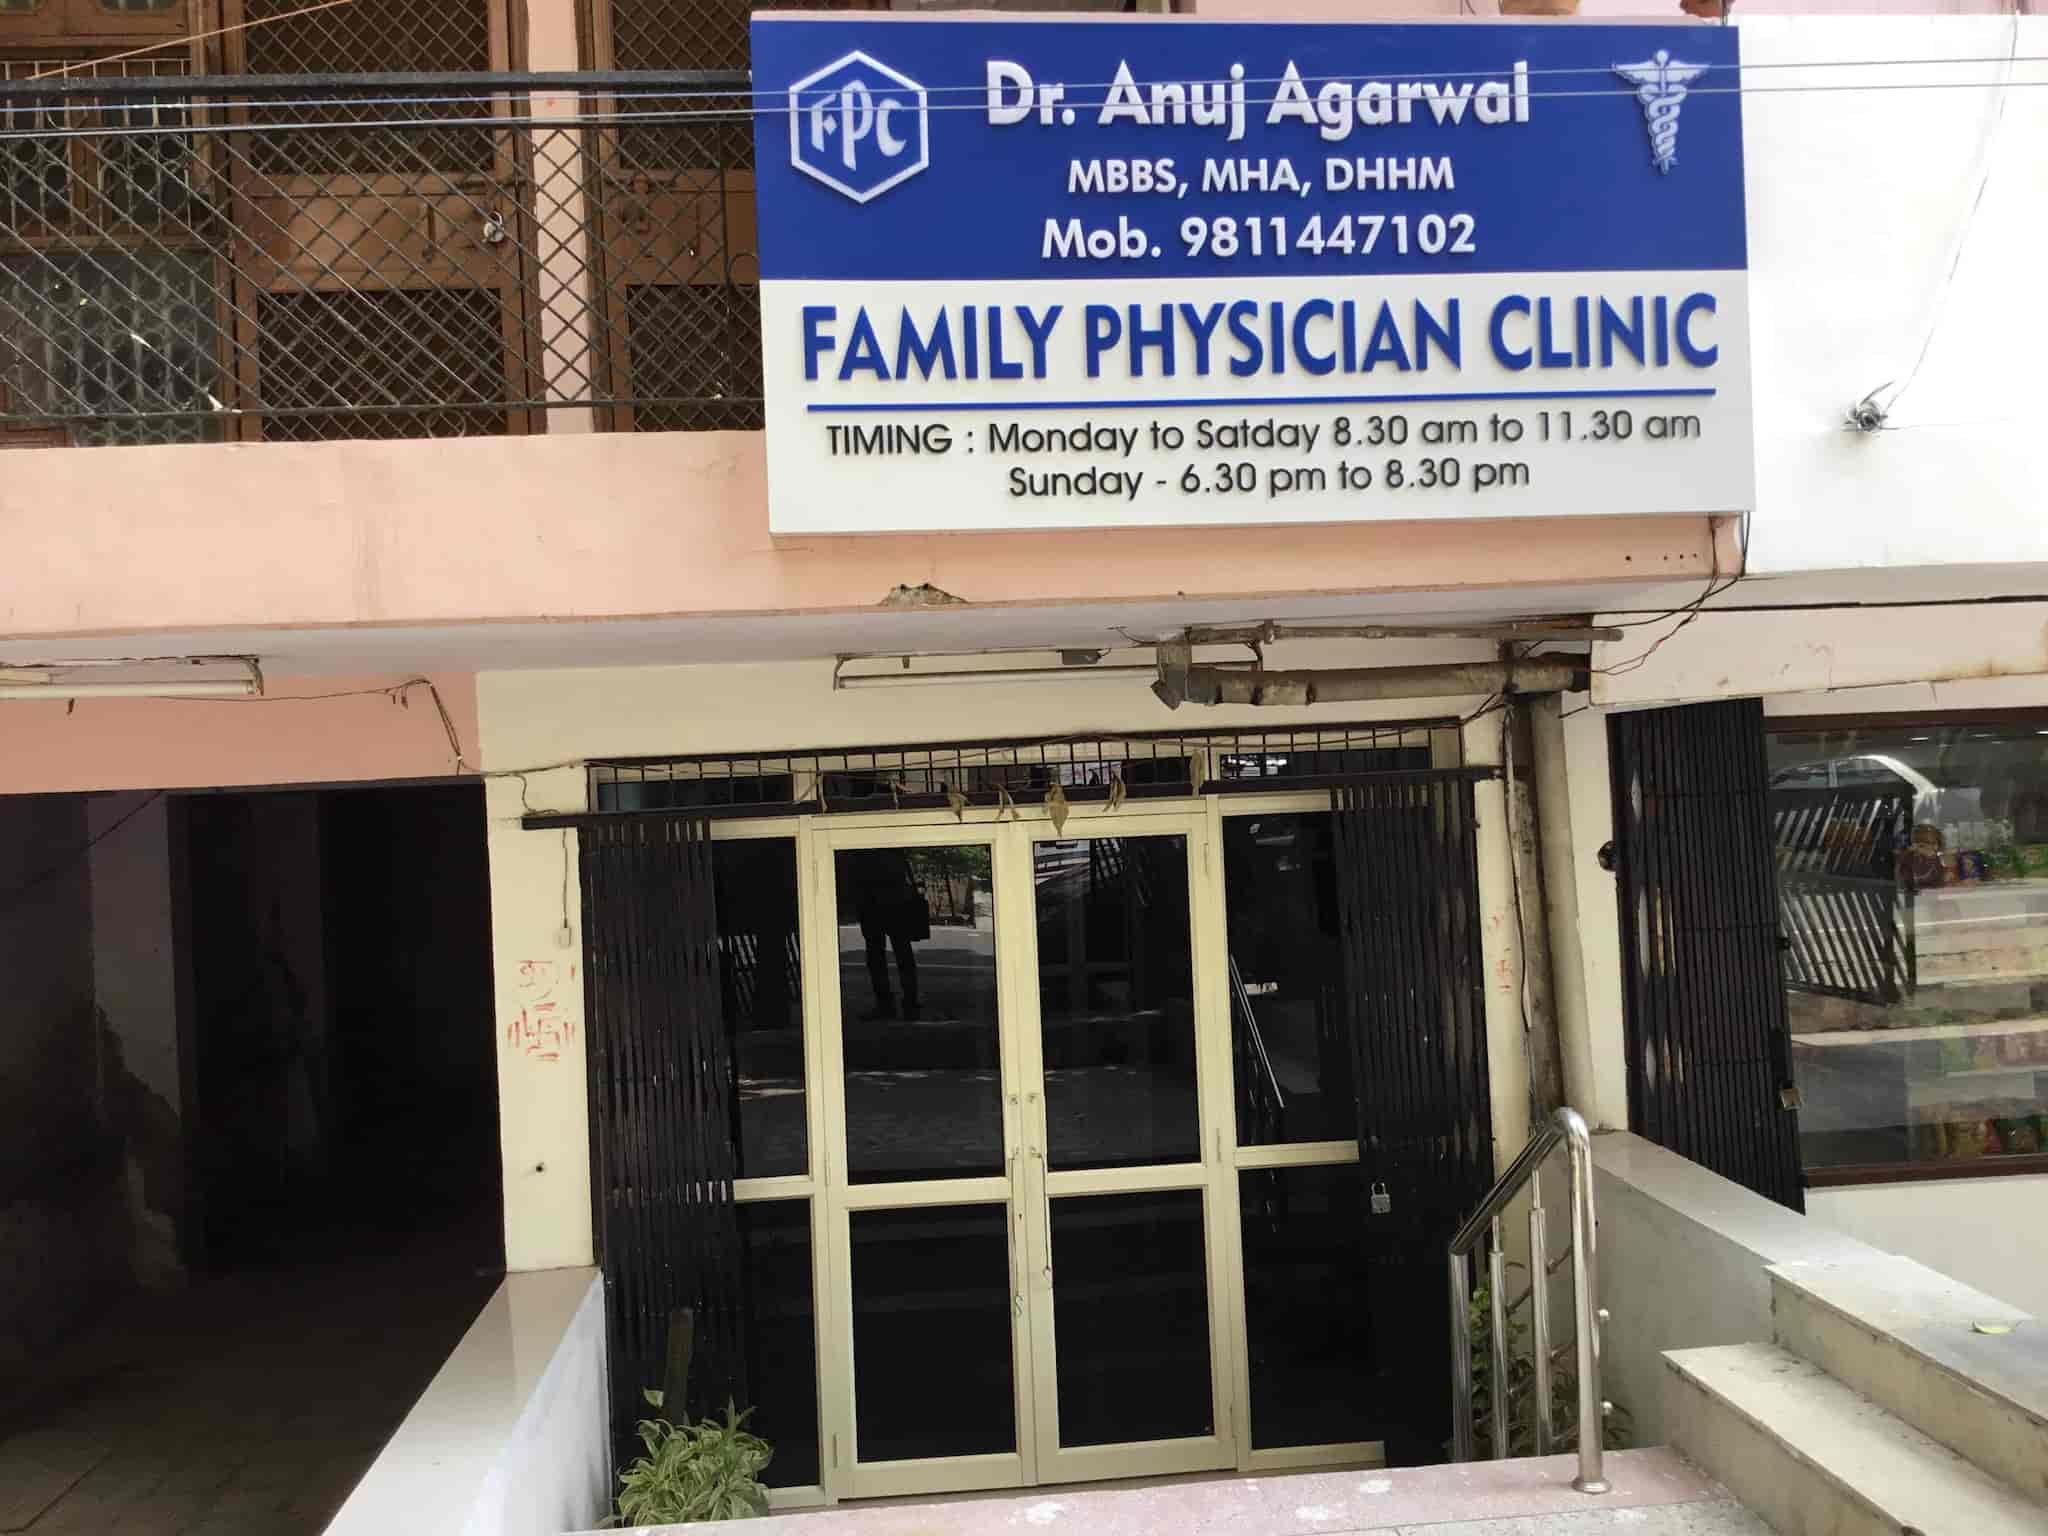 Family Physician Clinic Photos, Vaishali Sector 4, Delhi